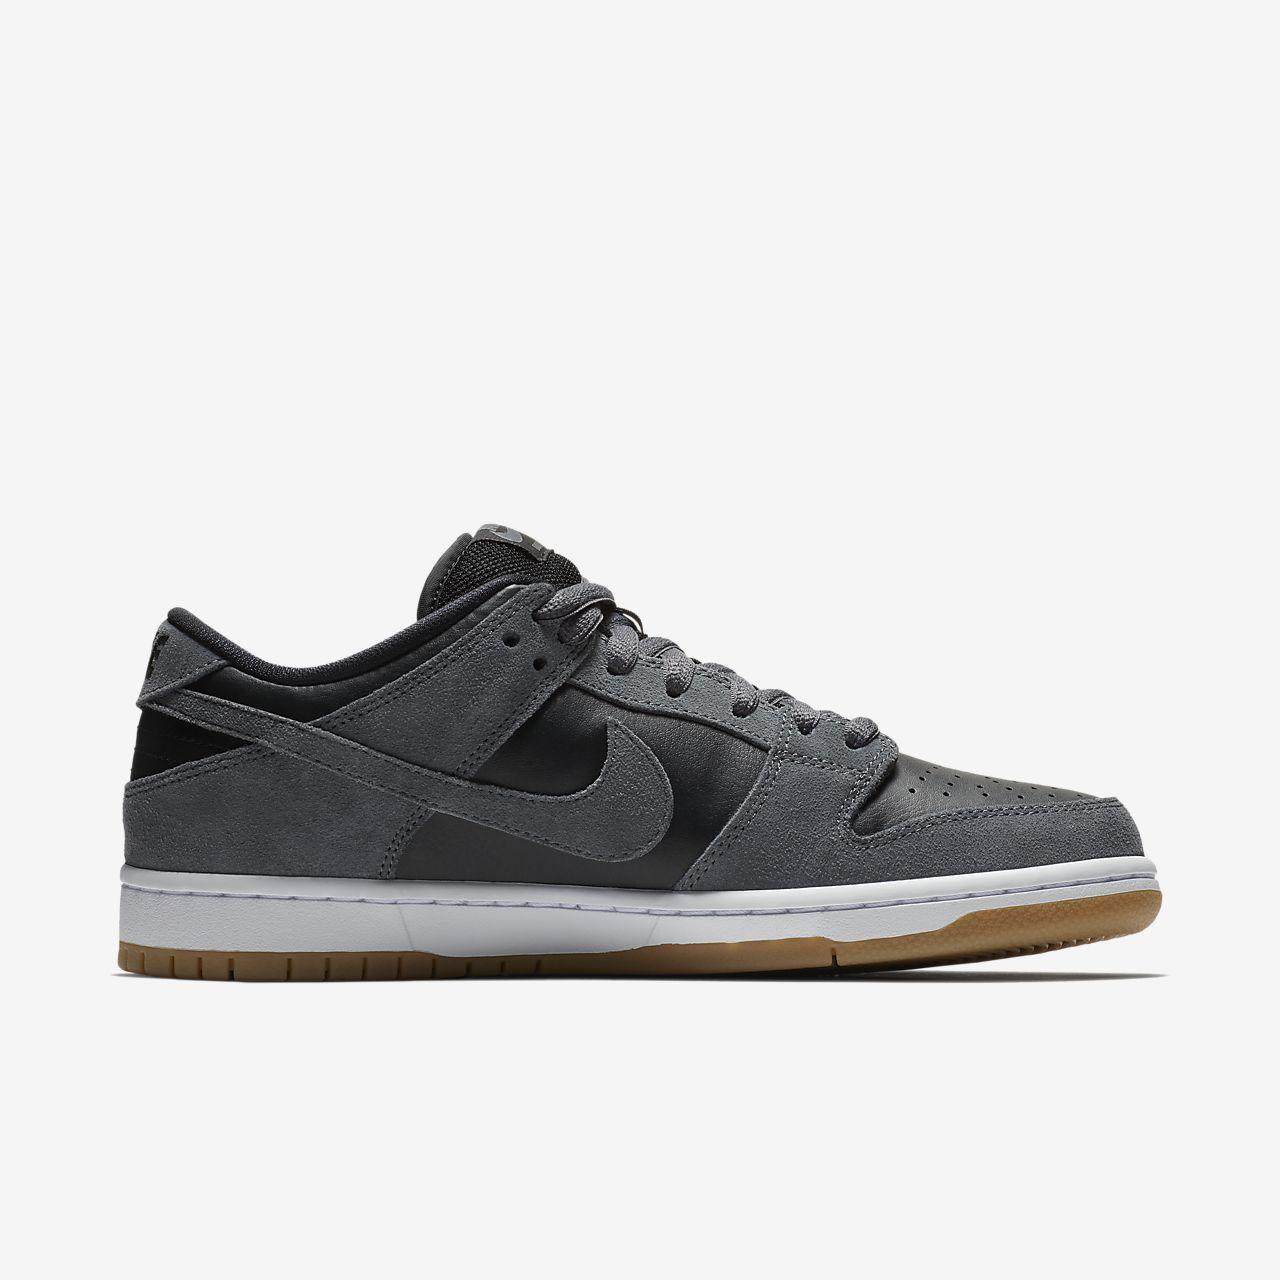 Scarpa da skateboard Nike SB Dunk Low TRD Uomo